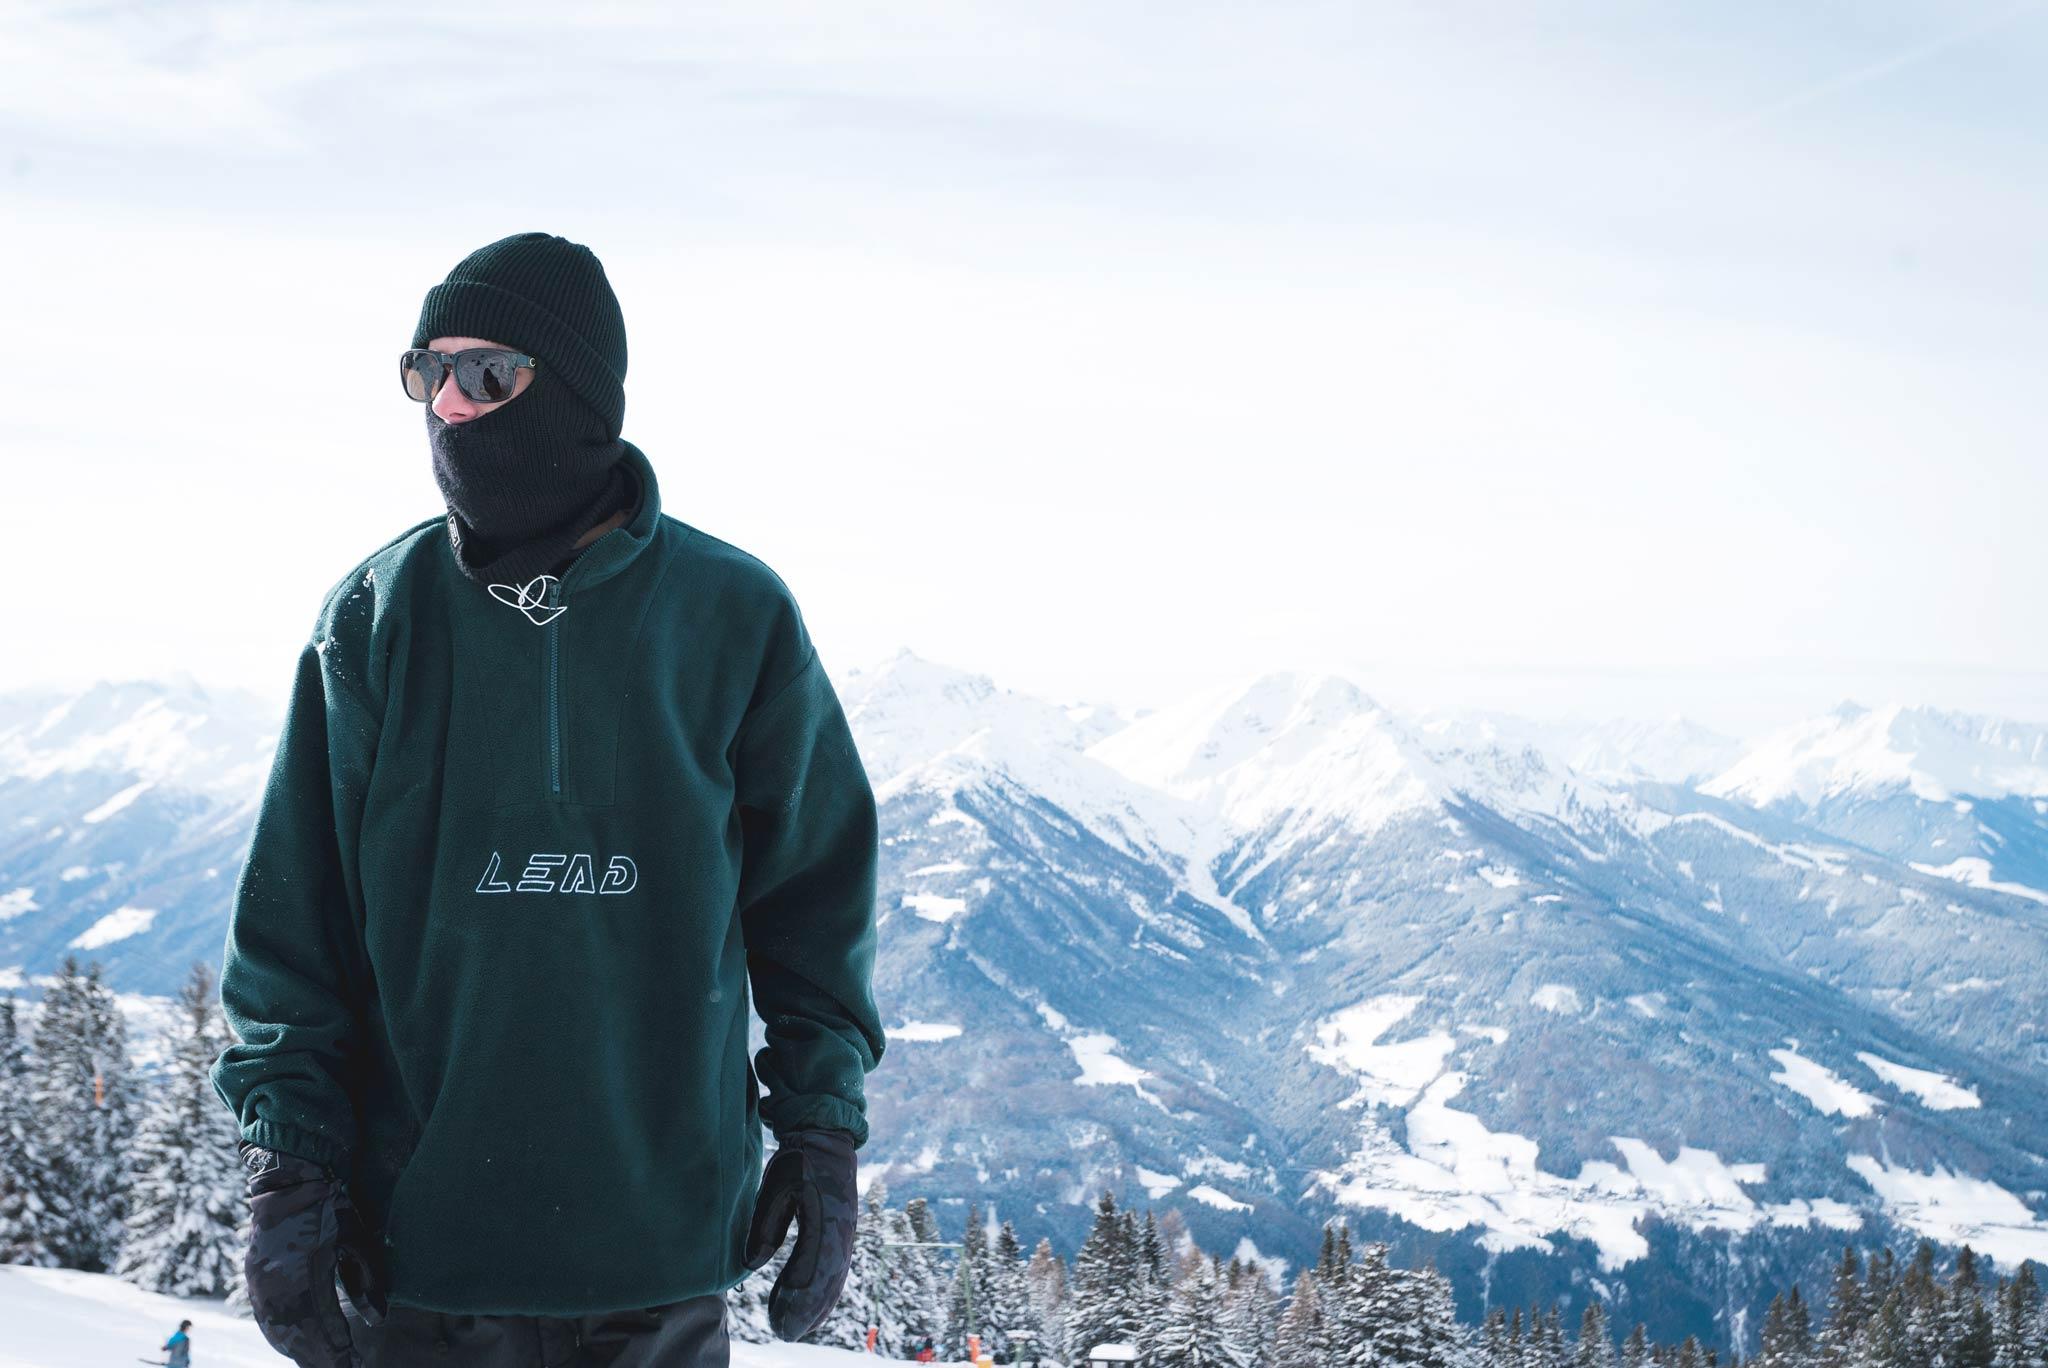 Location: Snowpark Patscherkofel - Foto: Jörg Angeli